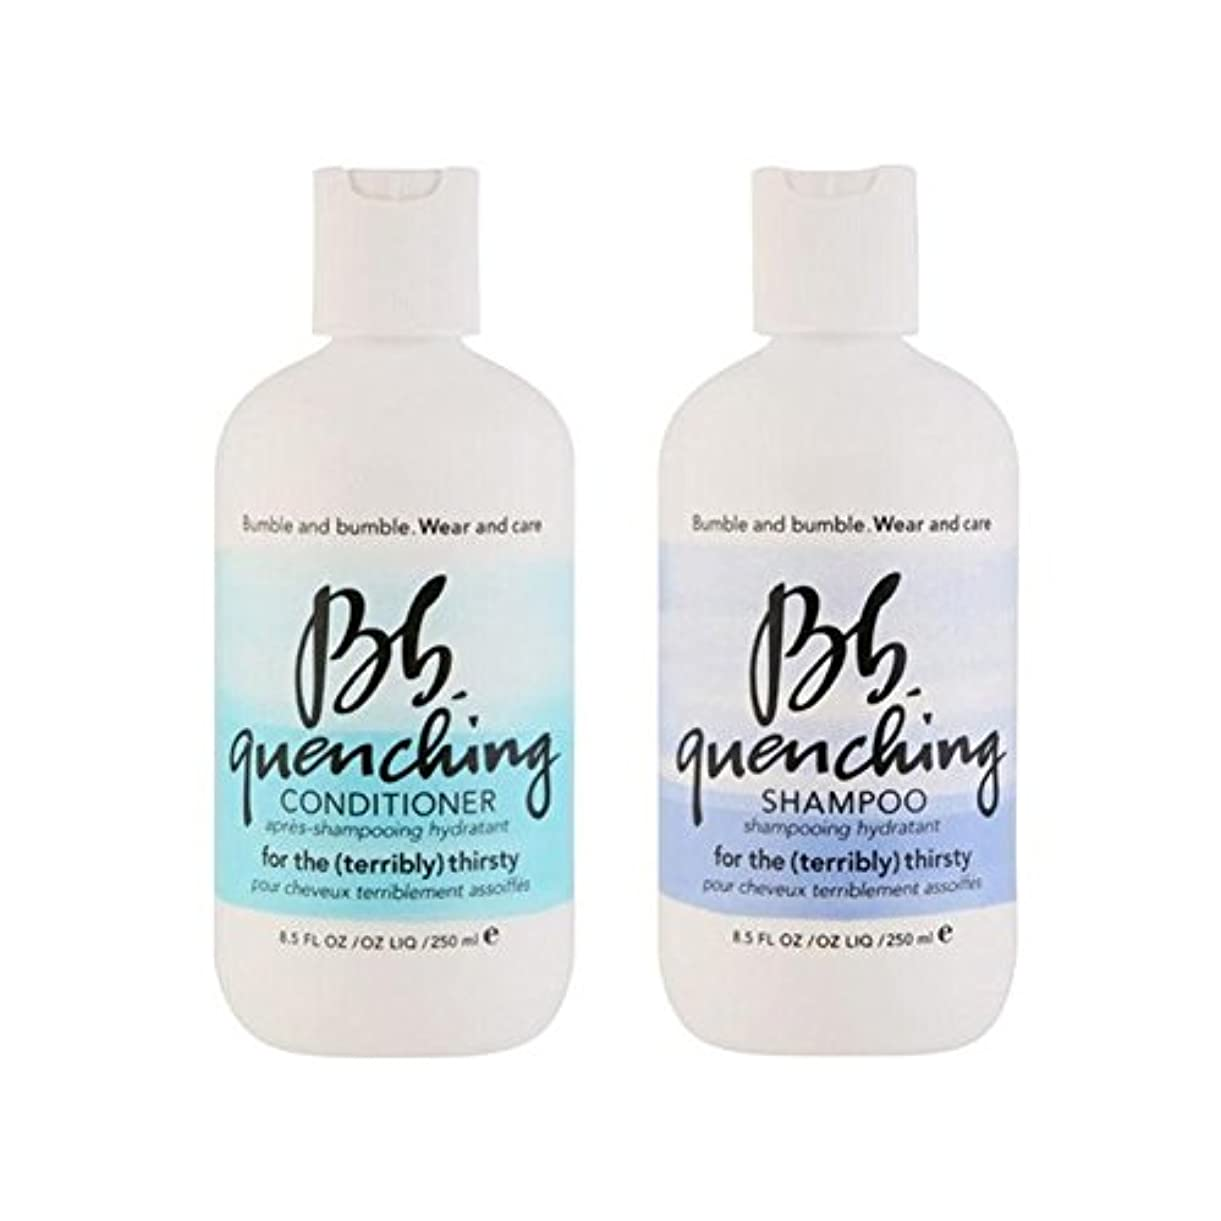 Bb Wear And Care Quenching Duo - Shampoo And Conditioner (Pack of 6) - シャンプーとコンディショナー - デュオを急冷着用し、世話 x6 [並行輸入品]